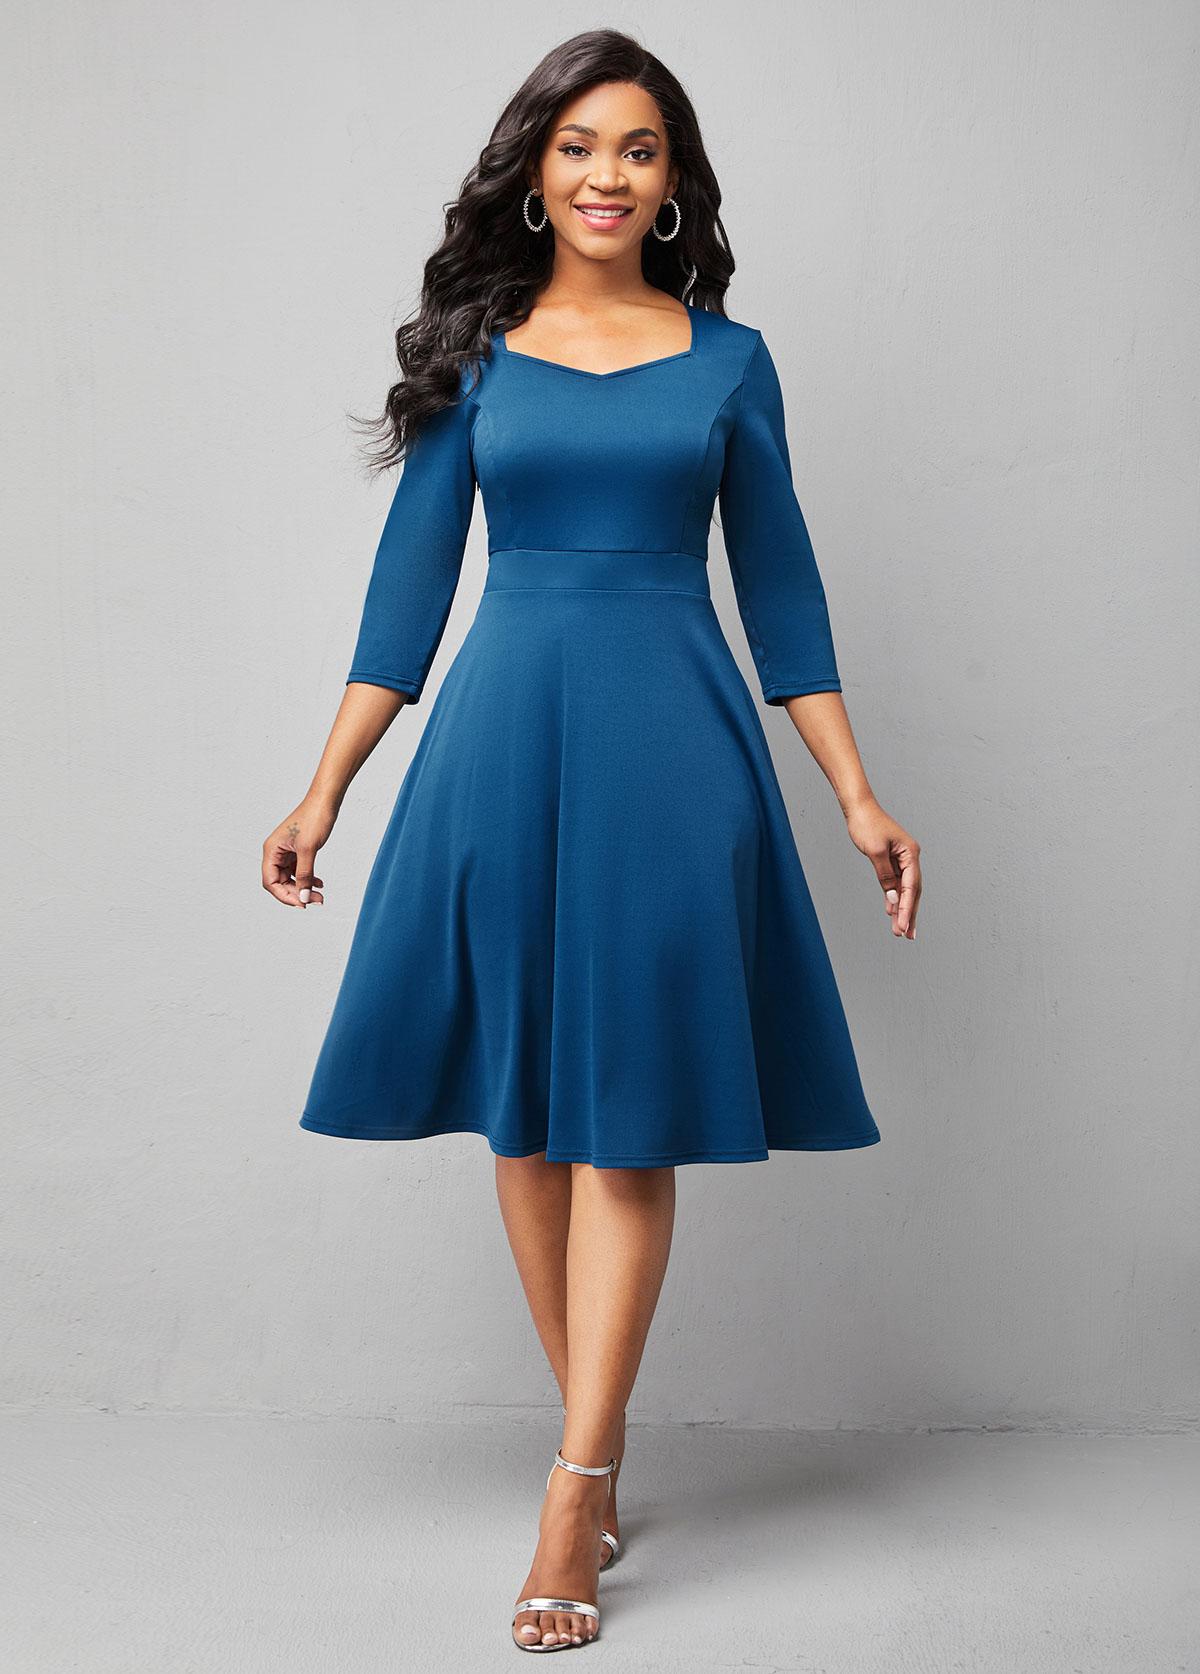 Solid 3/4 Sleeve Sweetheart Neckline Dress